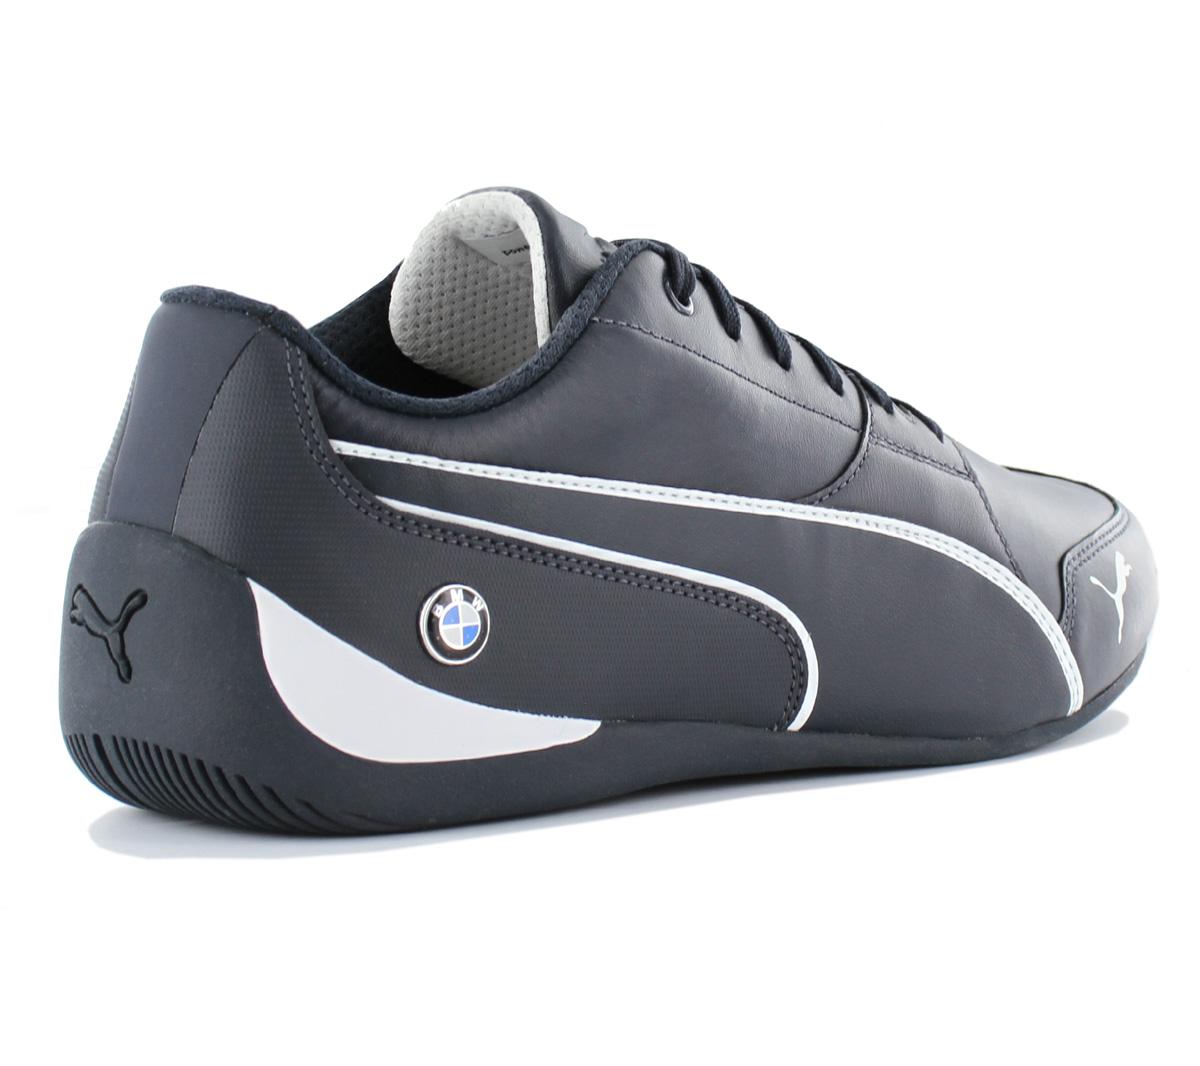 NEW Puma BMW MS Drift Cat 7 305986-01 Men  s Shoes Trainers Sneakers ... cb8a03e36